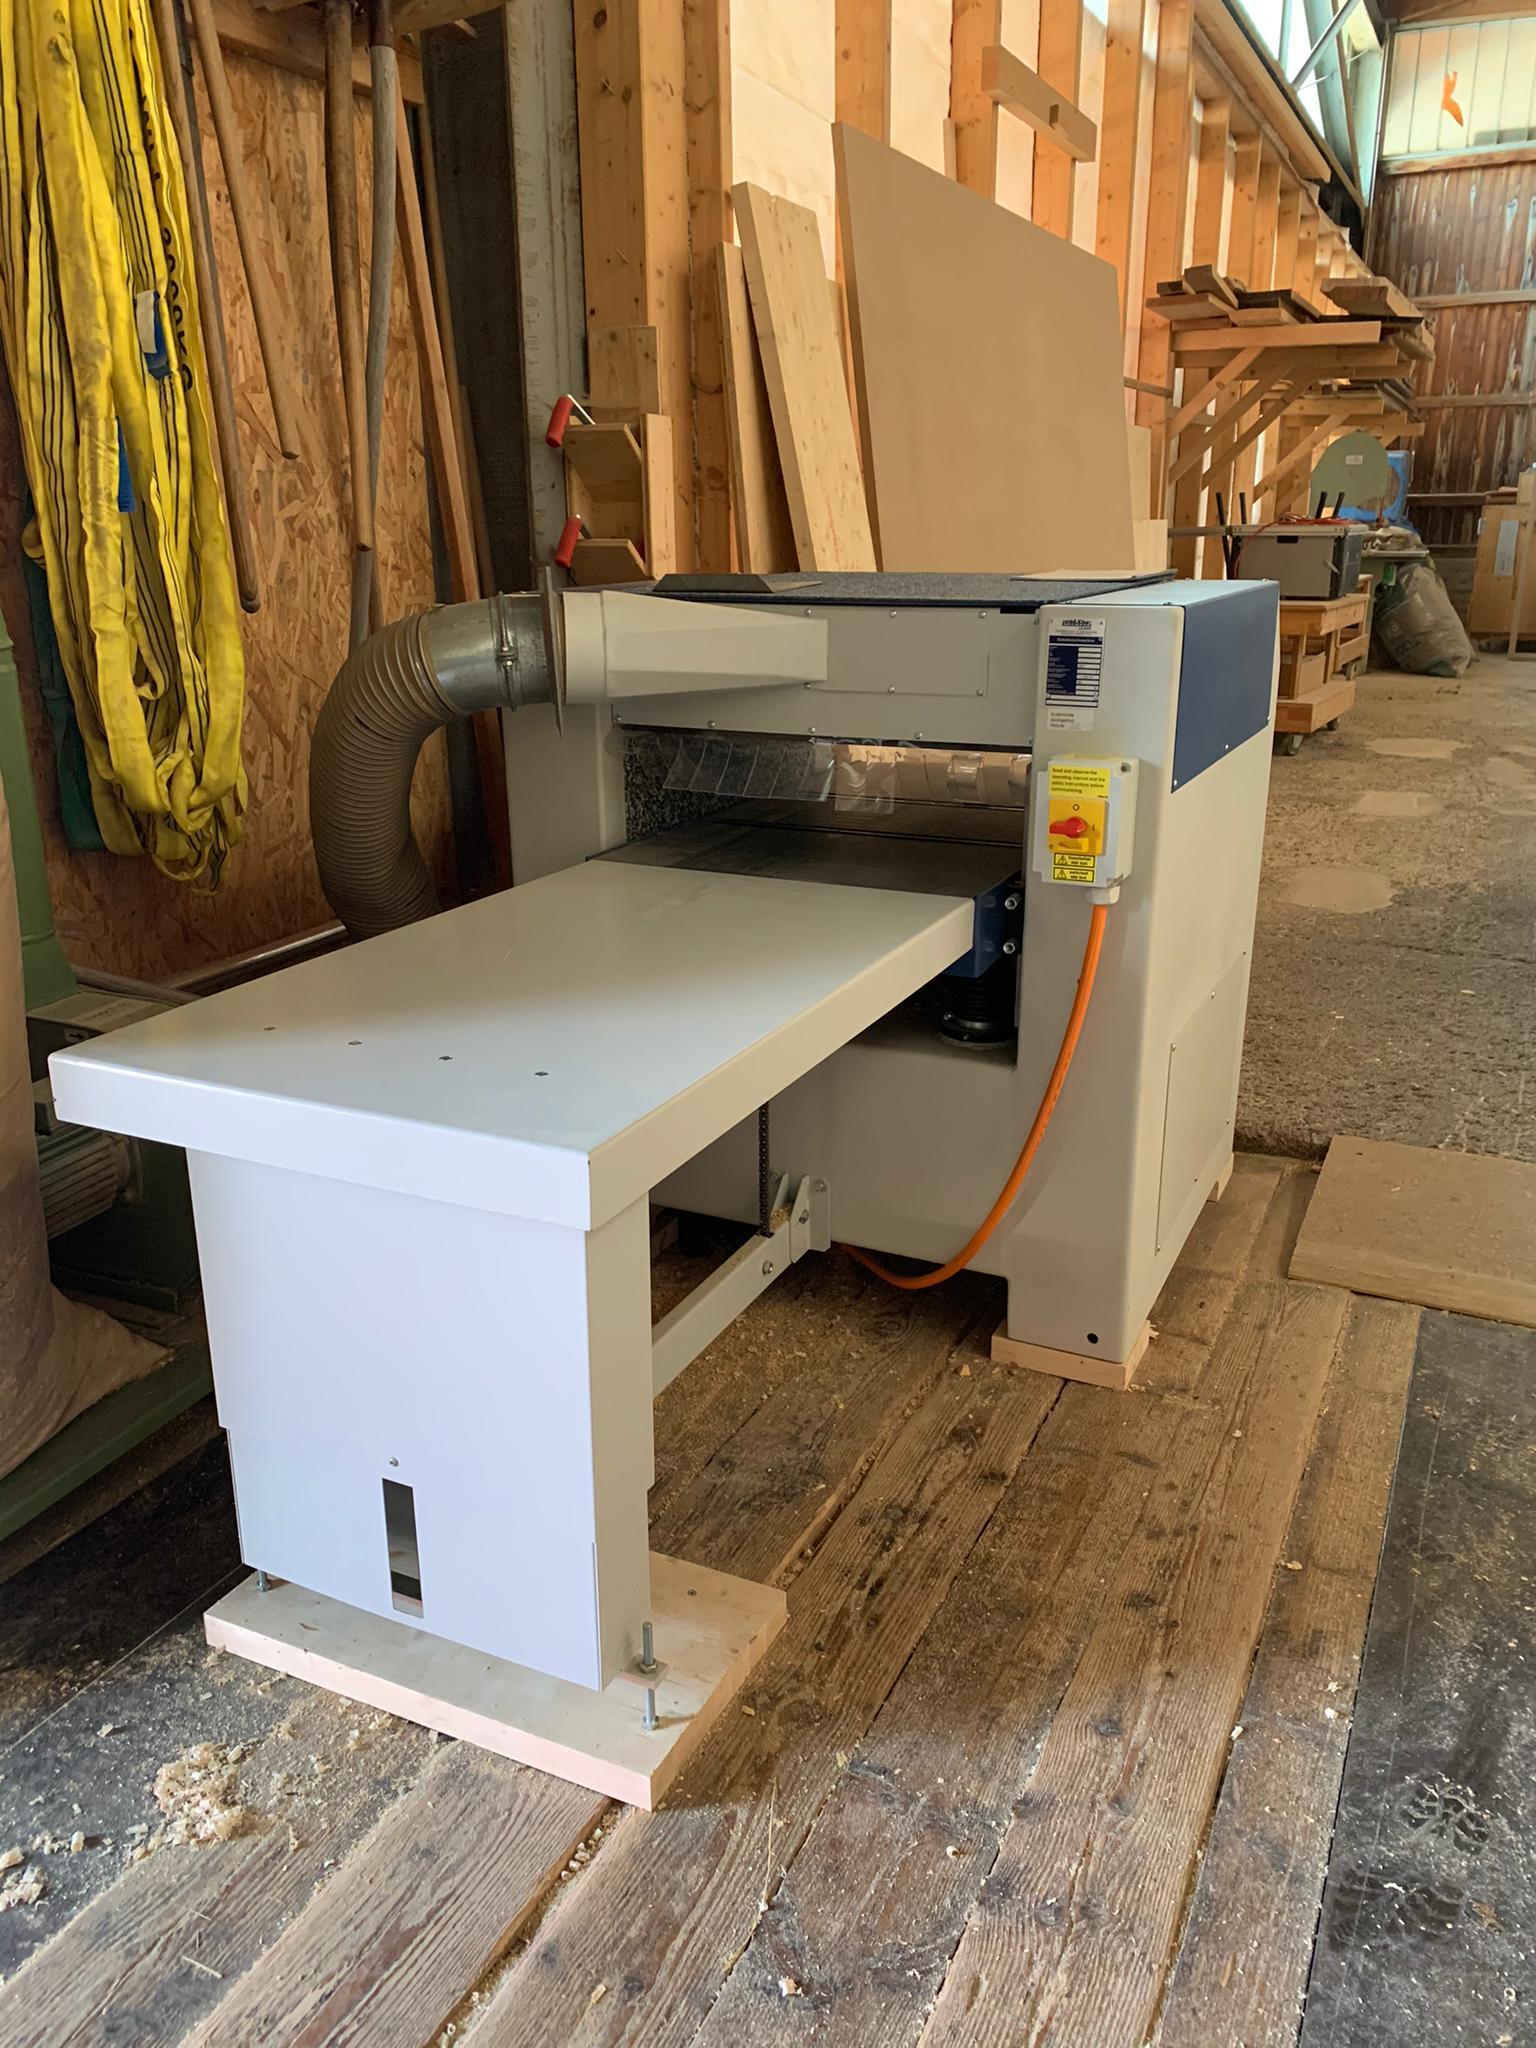 panhans-436-10-hobelmaschine